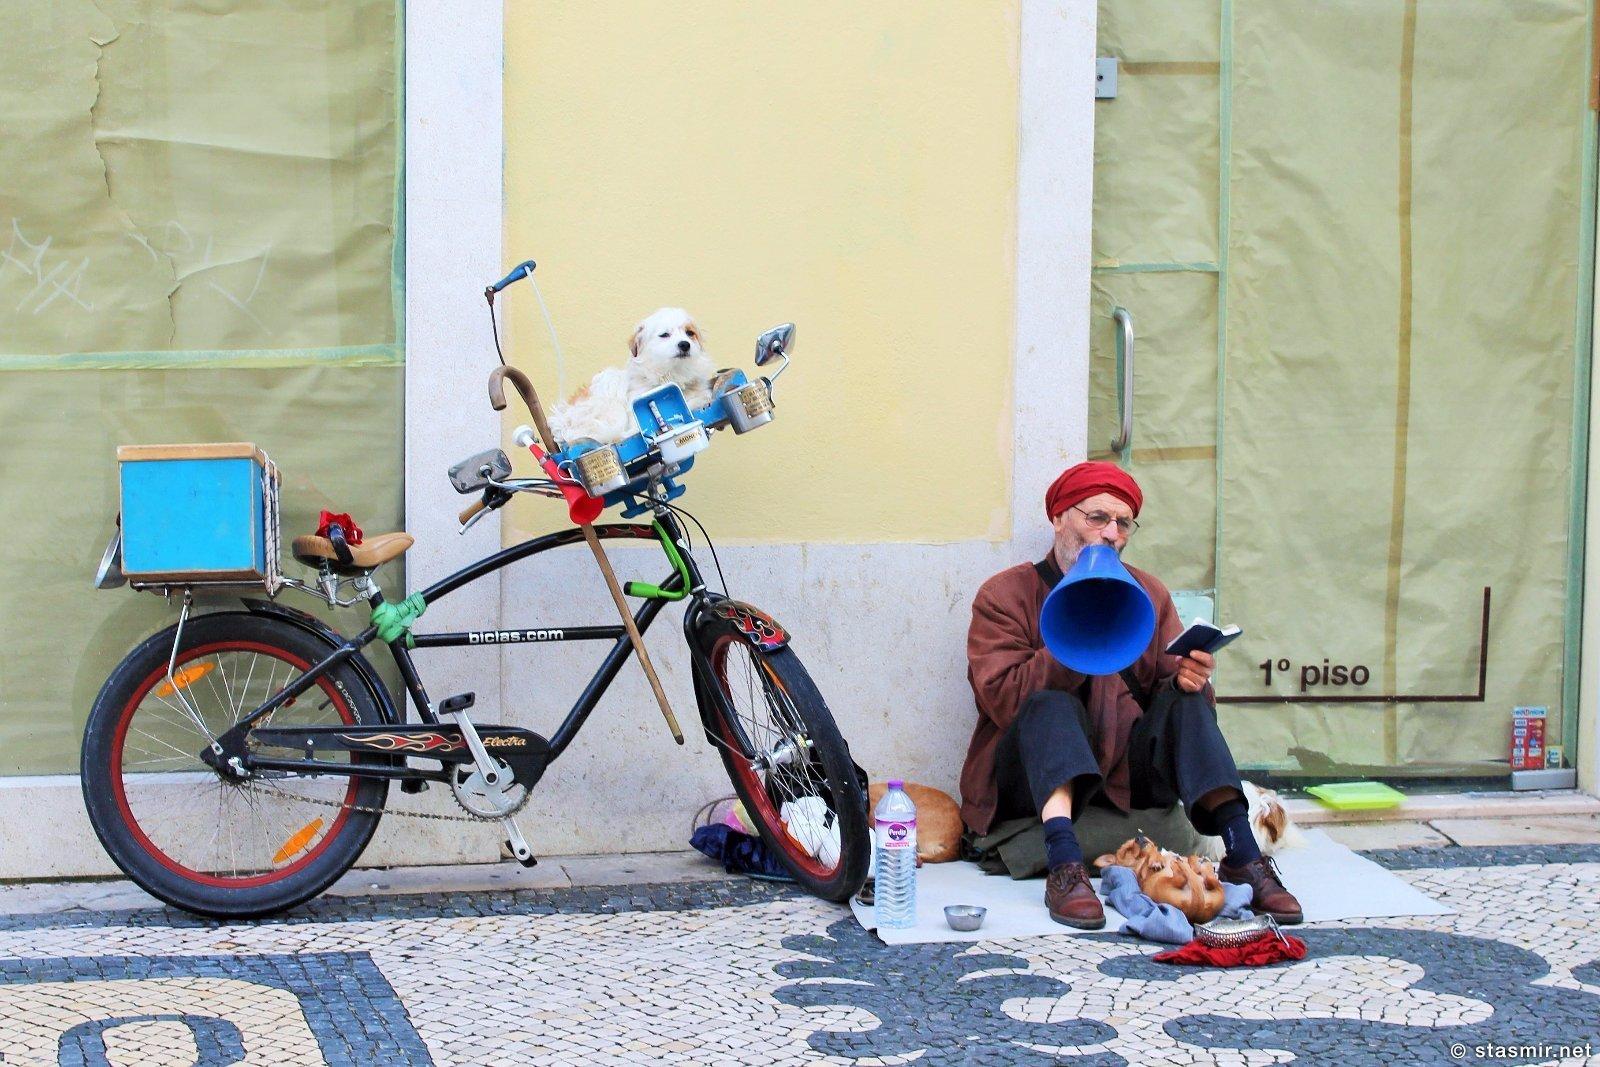 Rua Augusta, Baixa de Lisboa, Praça do Comércio, Руа Аугушта, Байша, Центр Лиссабона, Португалия, нищий на главной улице Лиссабона, Станислав Смирнов, Стасмир Трэвэл, Stanislav Smirnov, Stasmir, Stasmir Travel